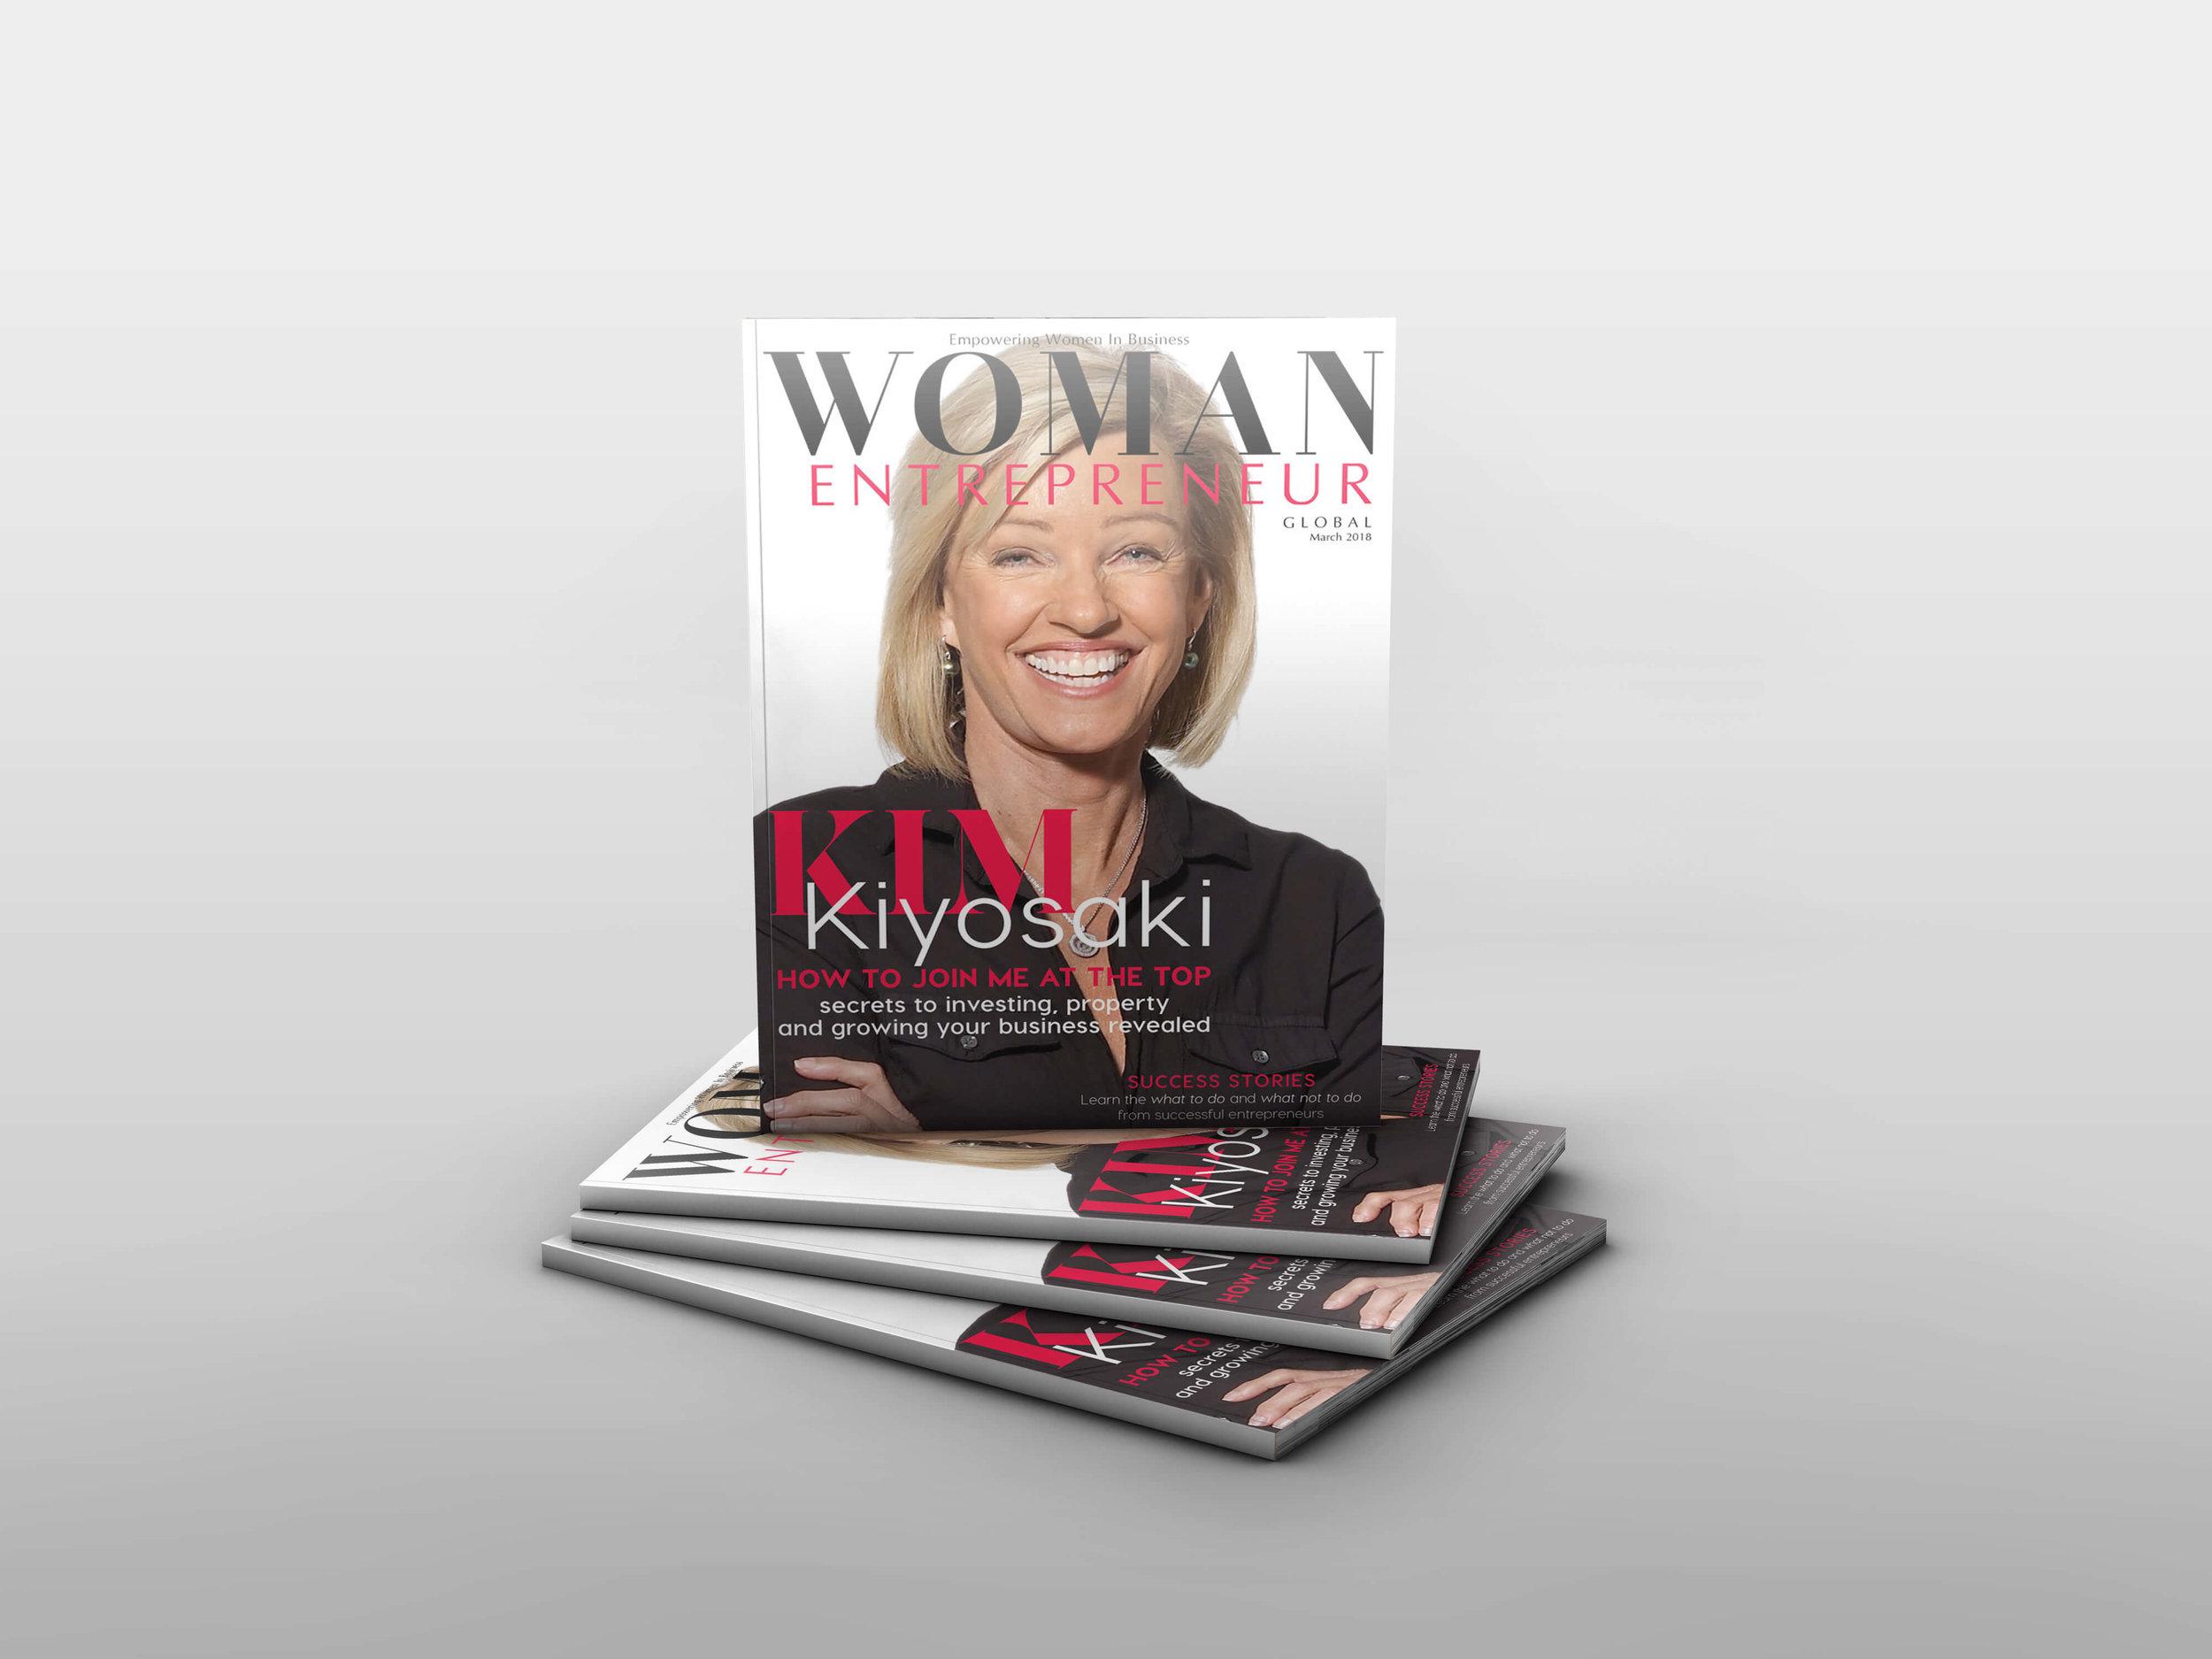 Digital Magazine Woman Entrepreneur - Kim Kiyosaki